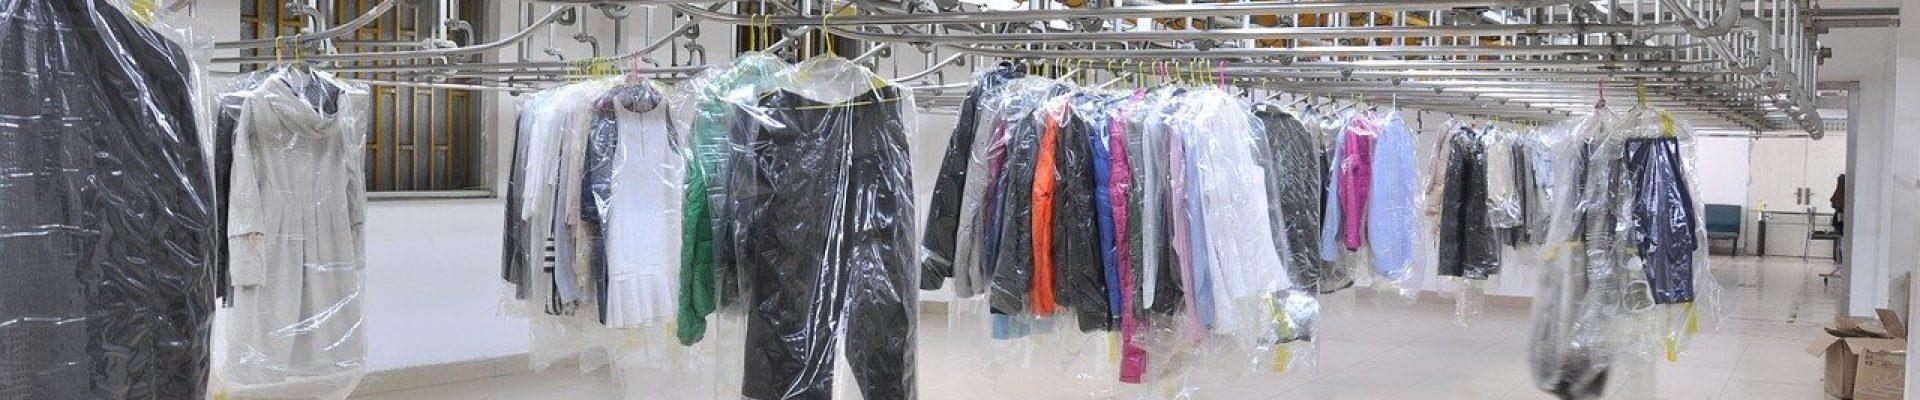 Pressing et blanchisserie robes